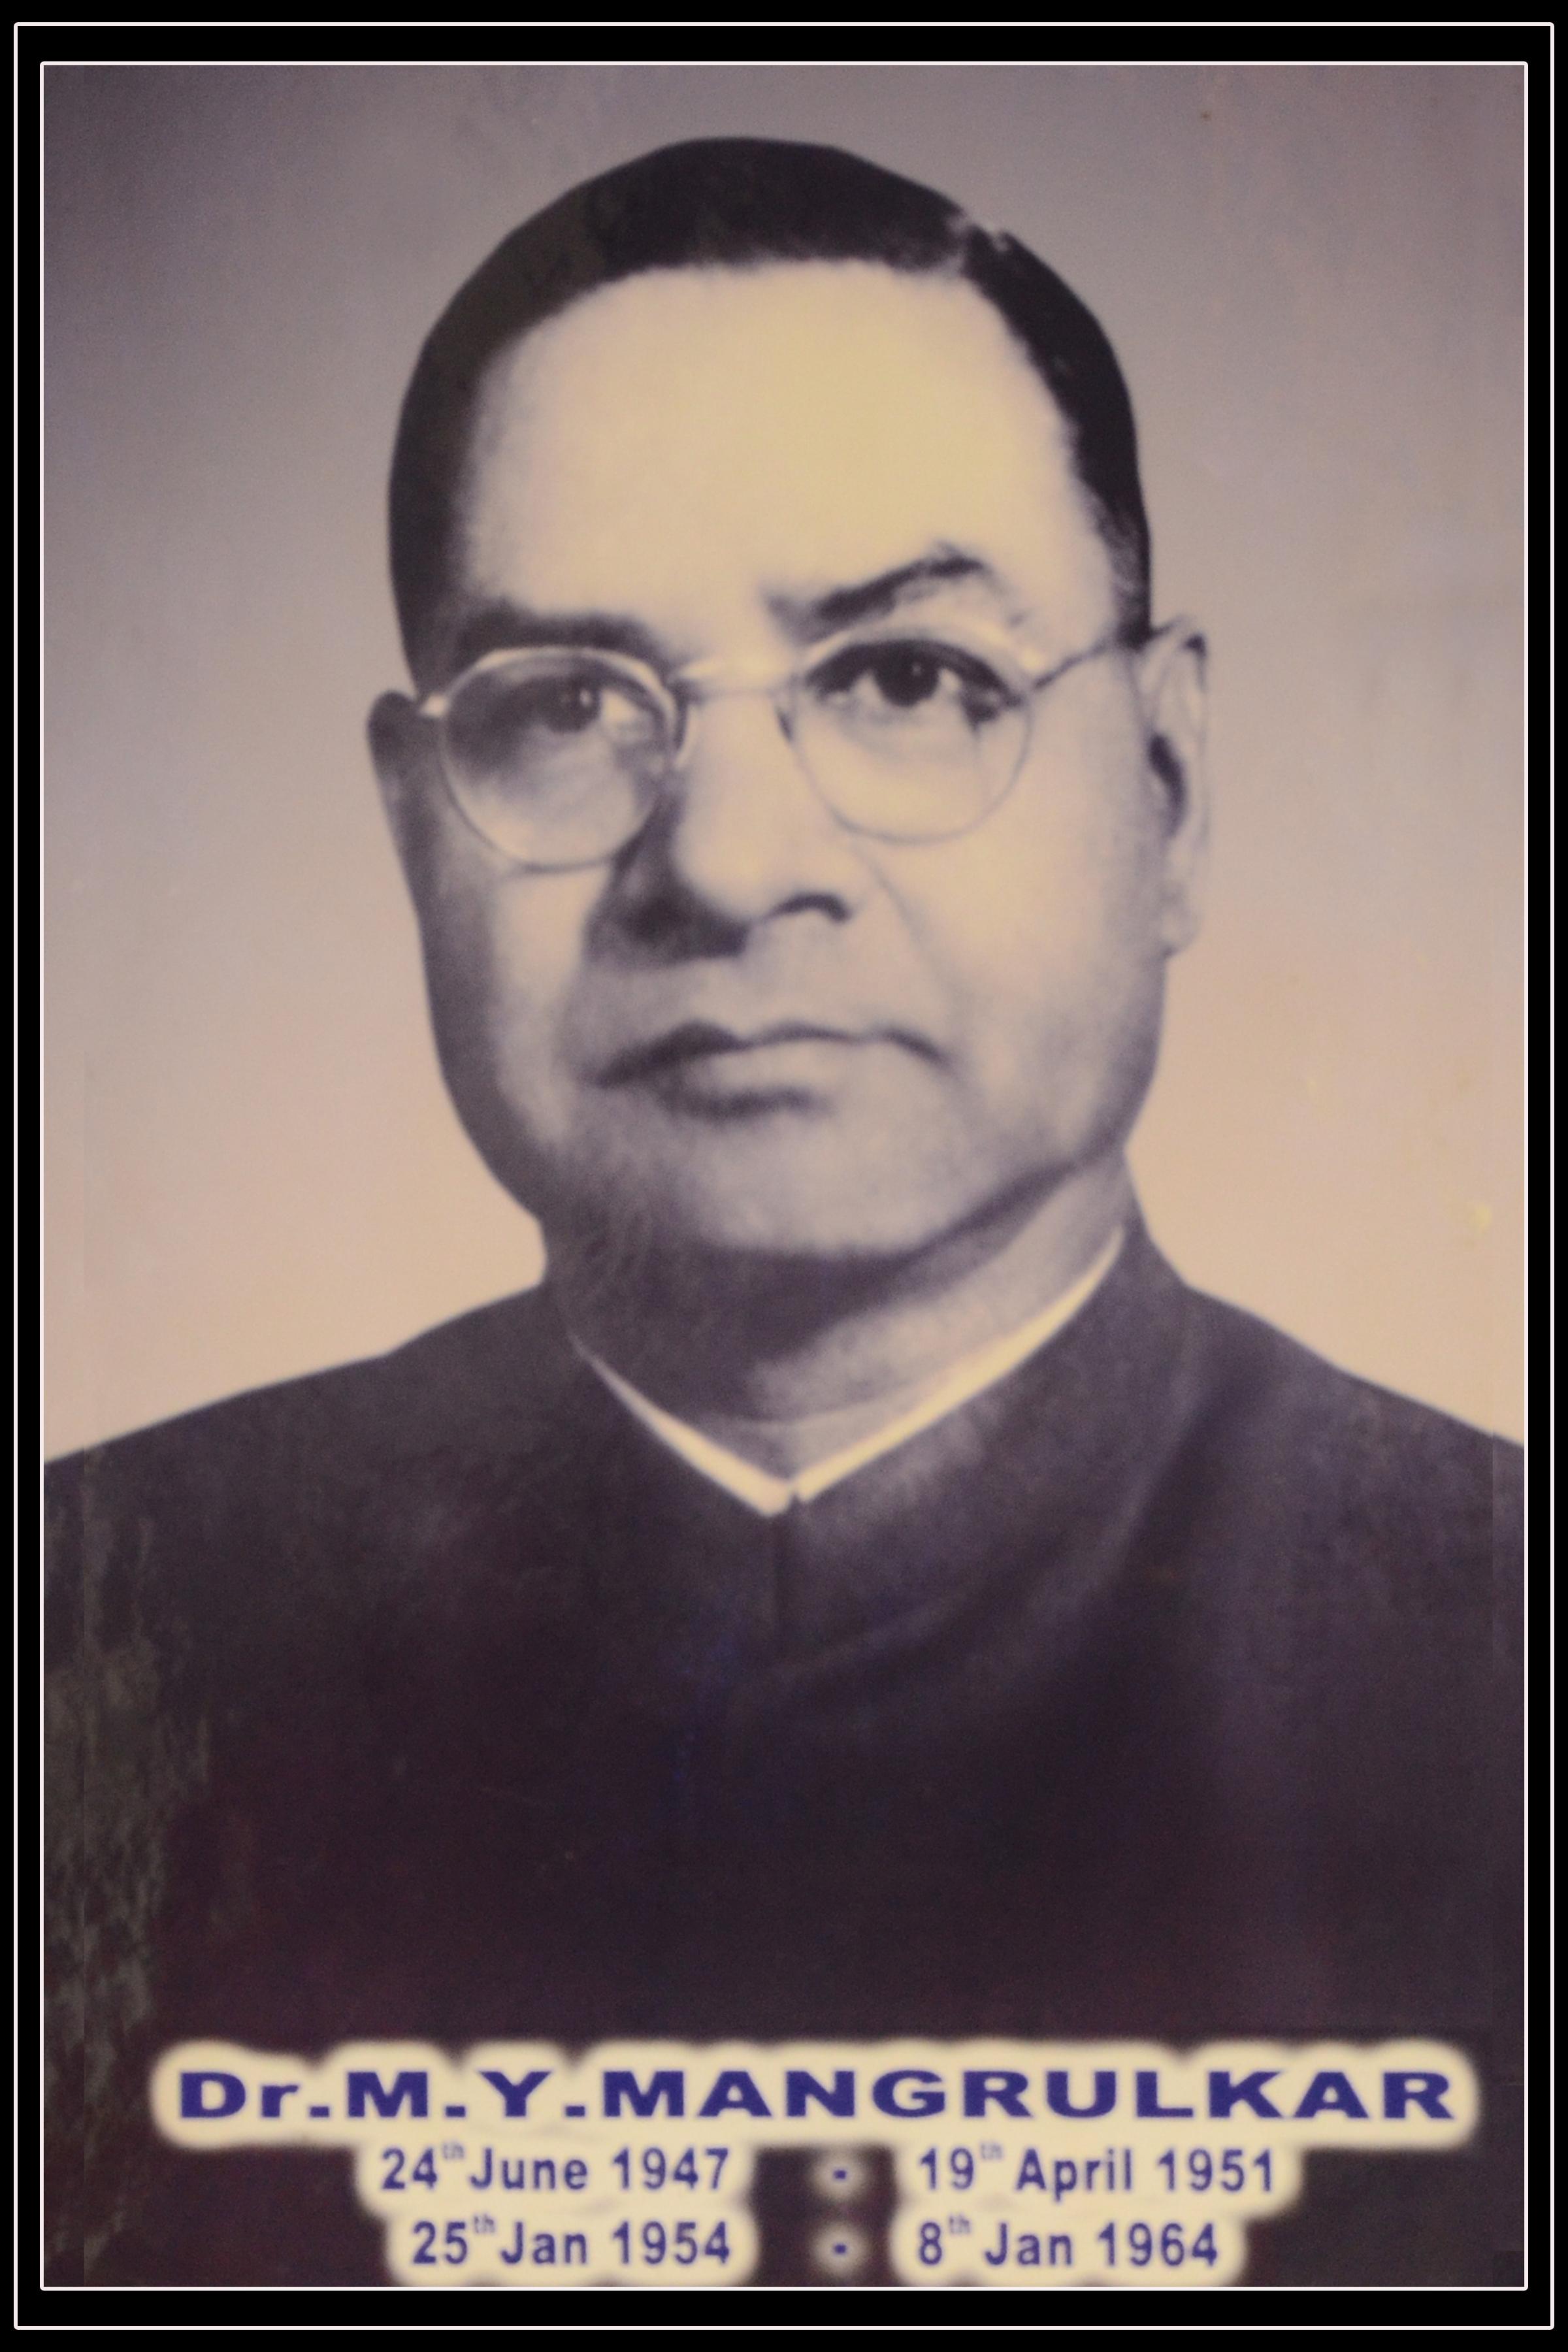 INDIAN ASSOCIATION OF VETERINARY PATHOLOGISTS